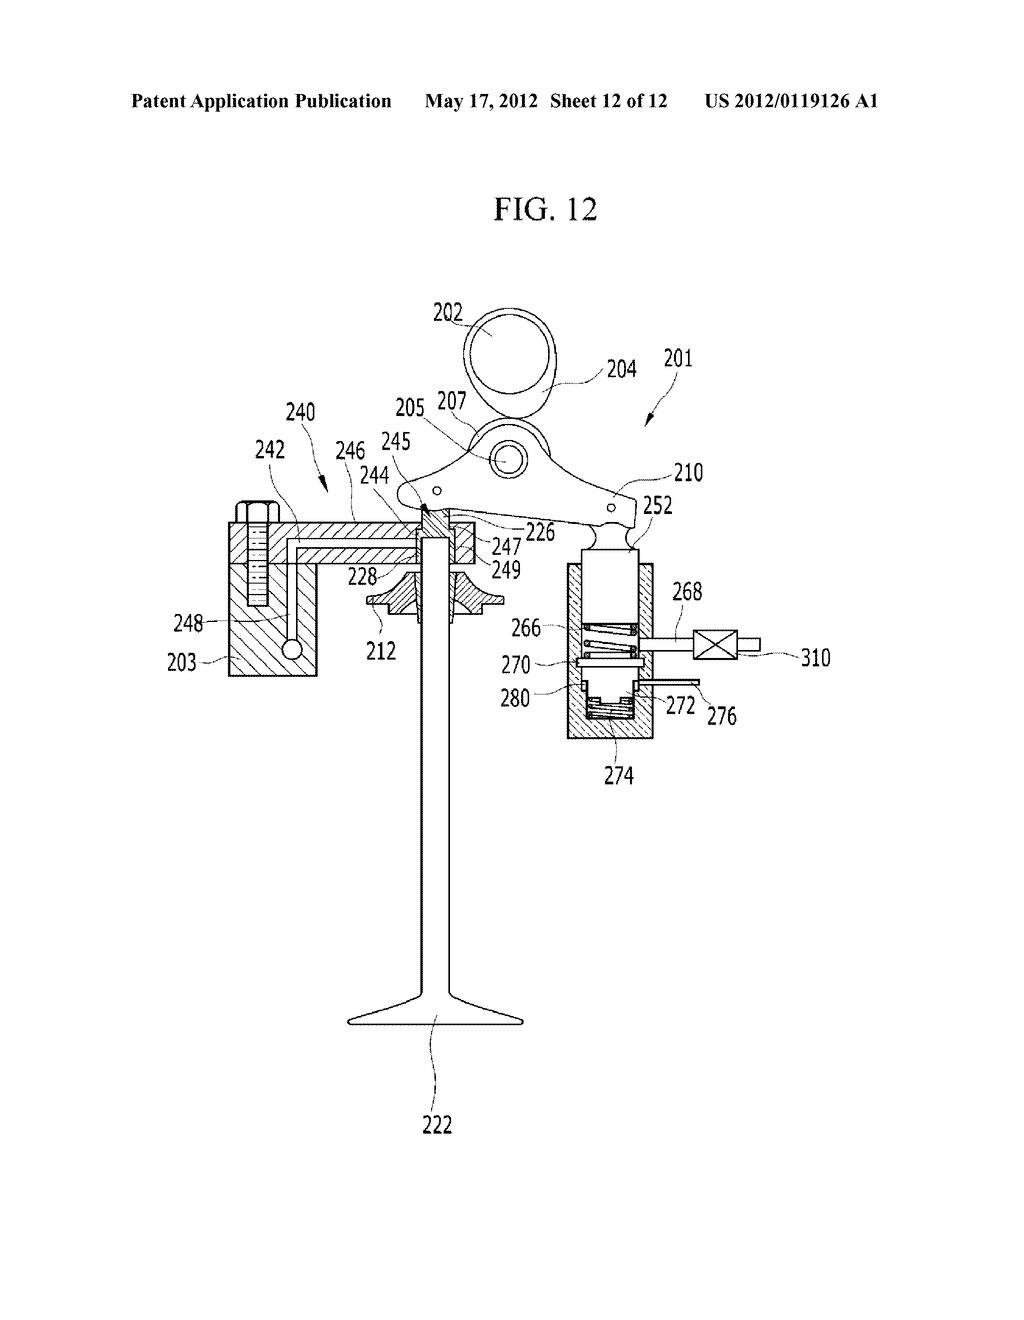 hight resolution of electro hydraulic valve train diagram schematic and image 13 rh patentsencyclopedia com overhead valve engine diagram